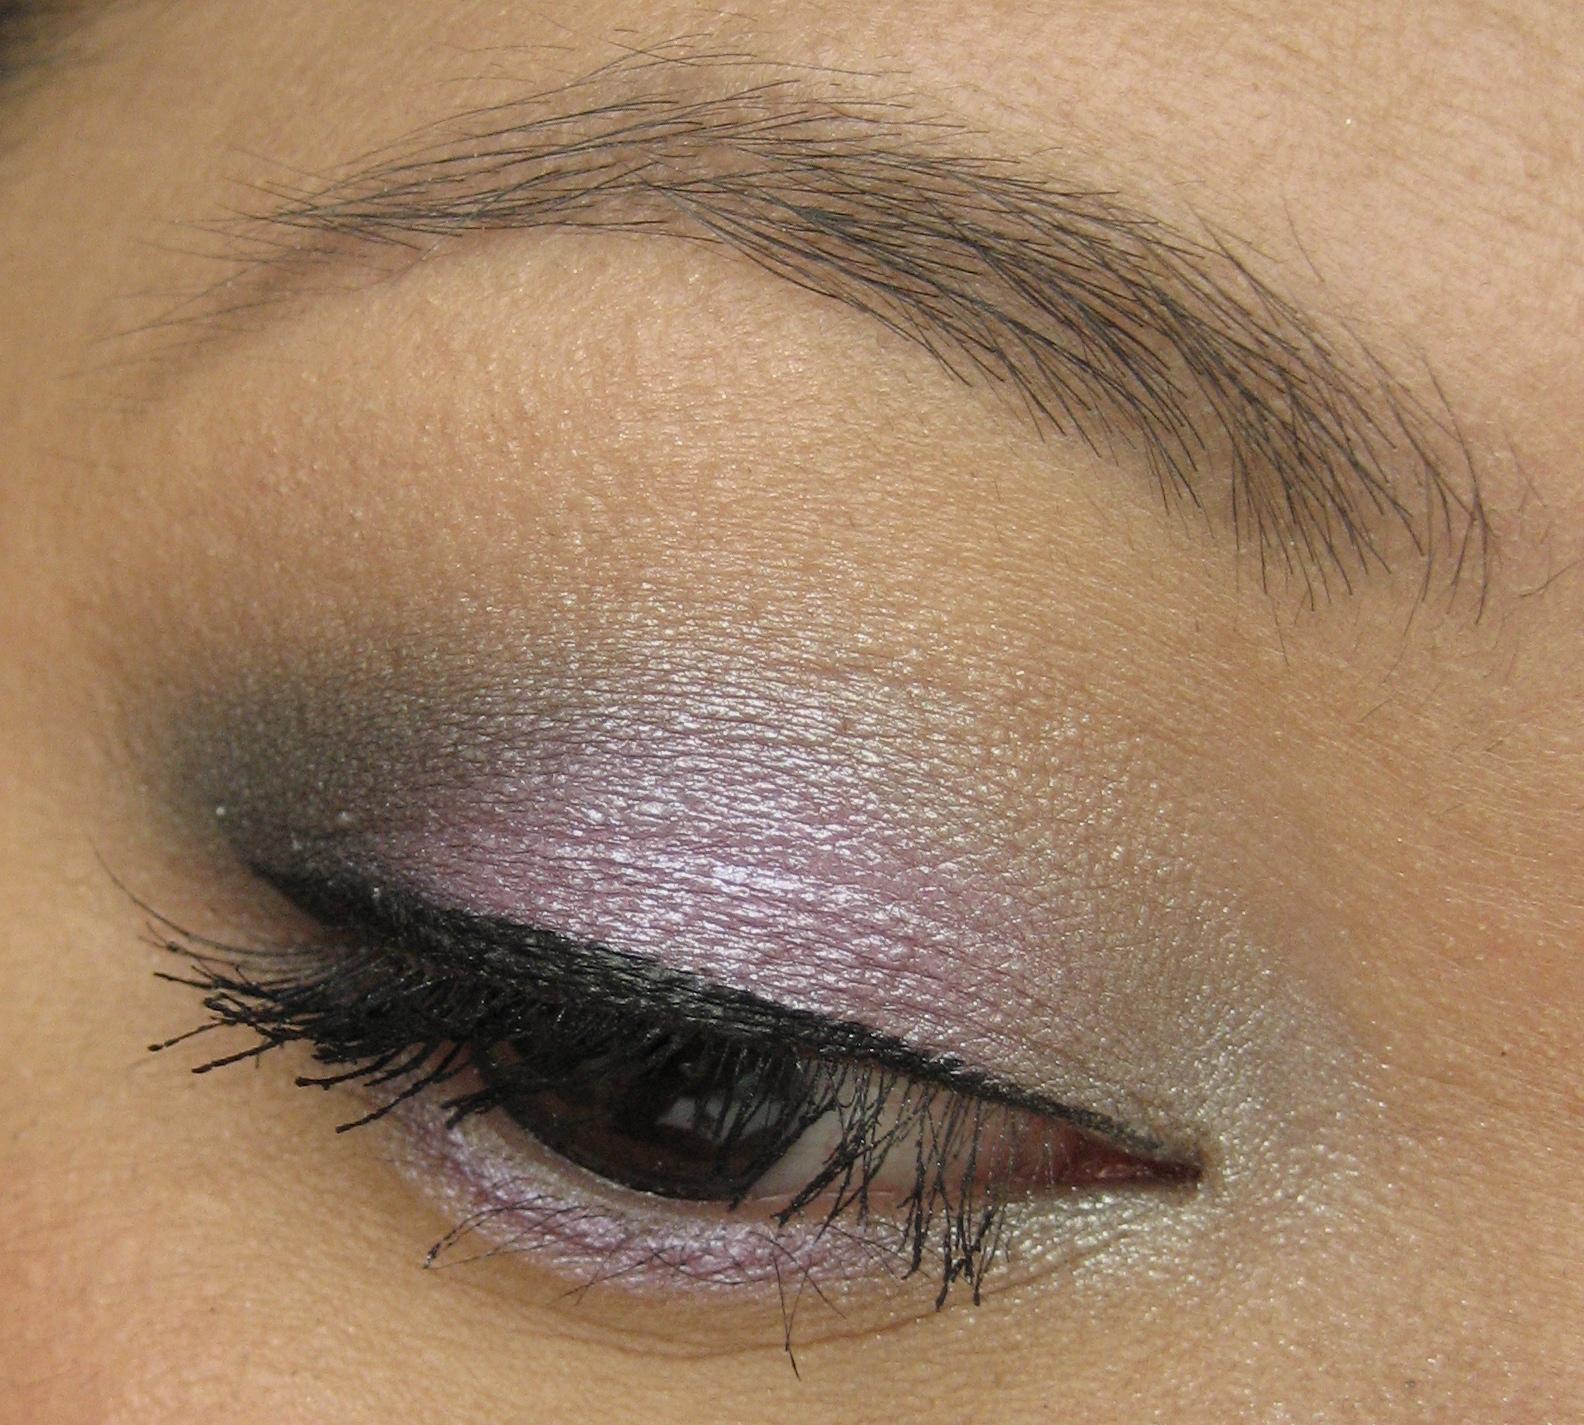 Delicate Hummingbird.: Dior 5 Couleurs Iridescent #089 Smoky Crystal